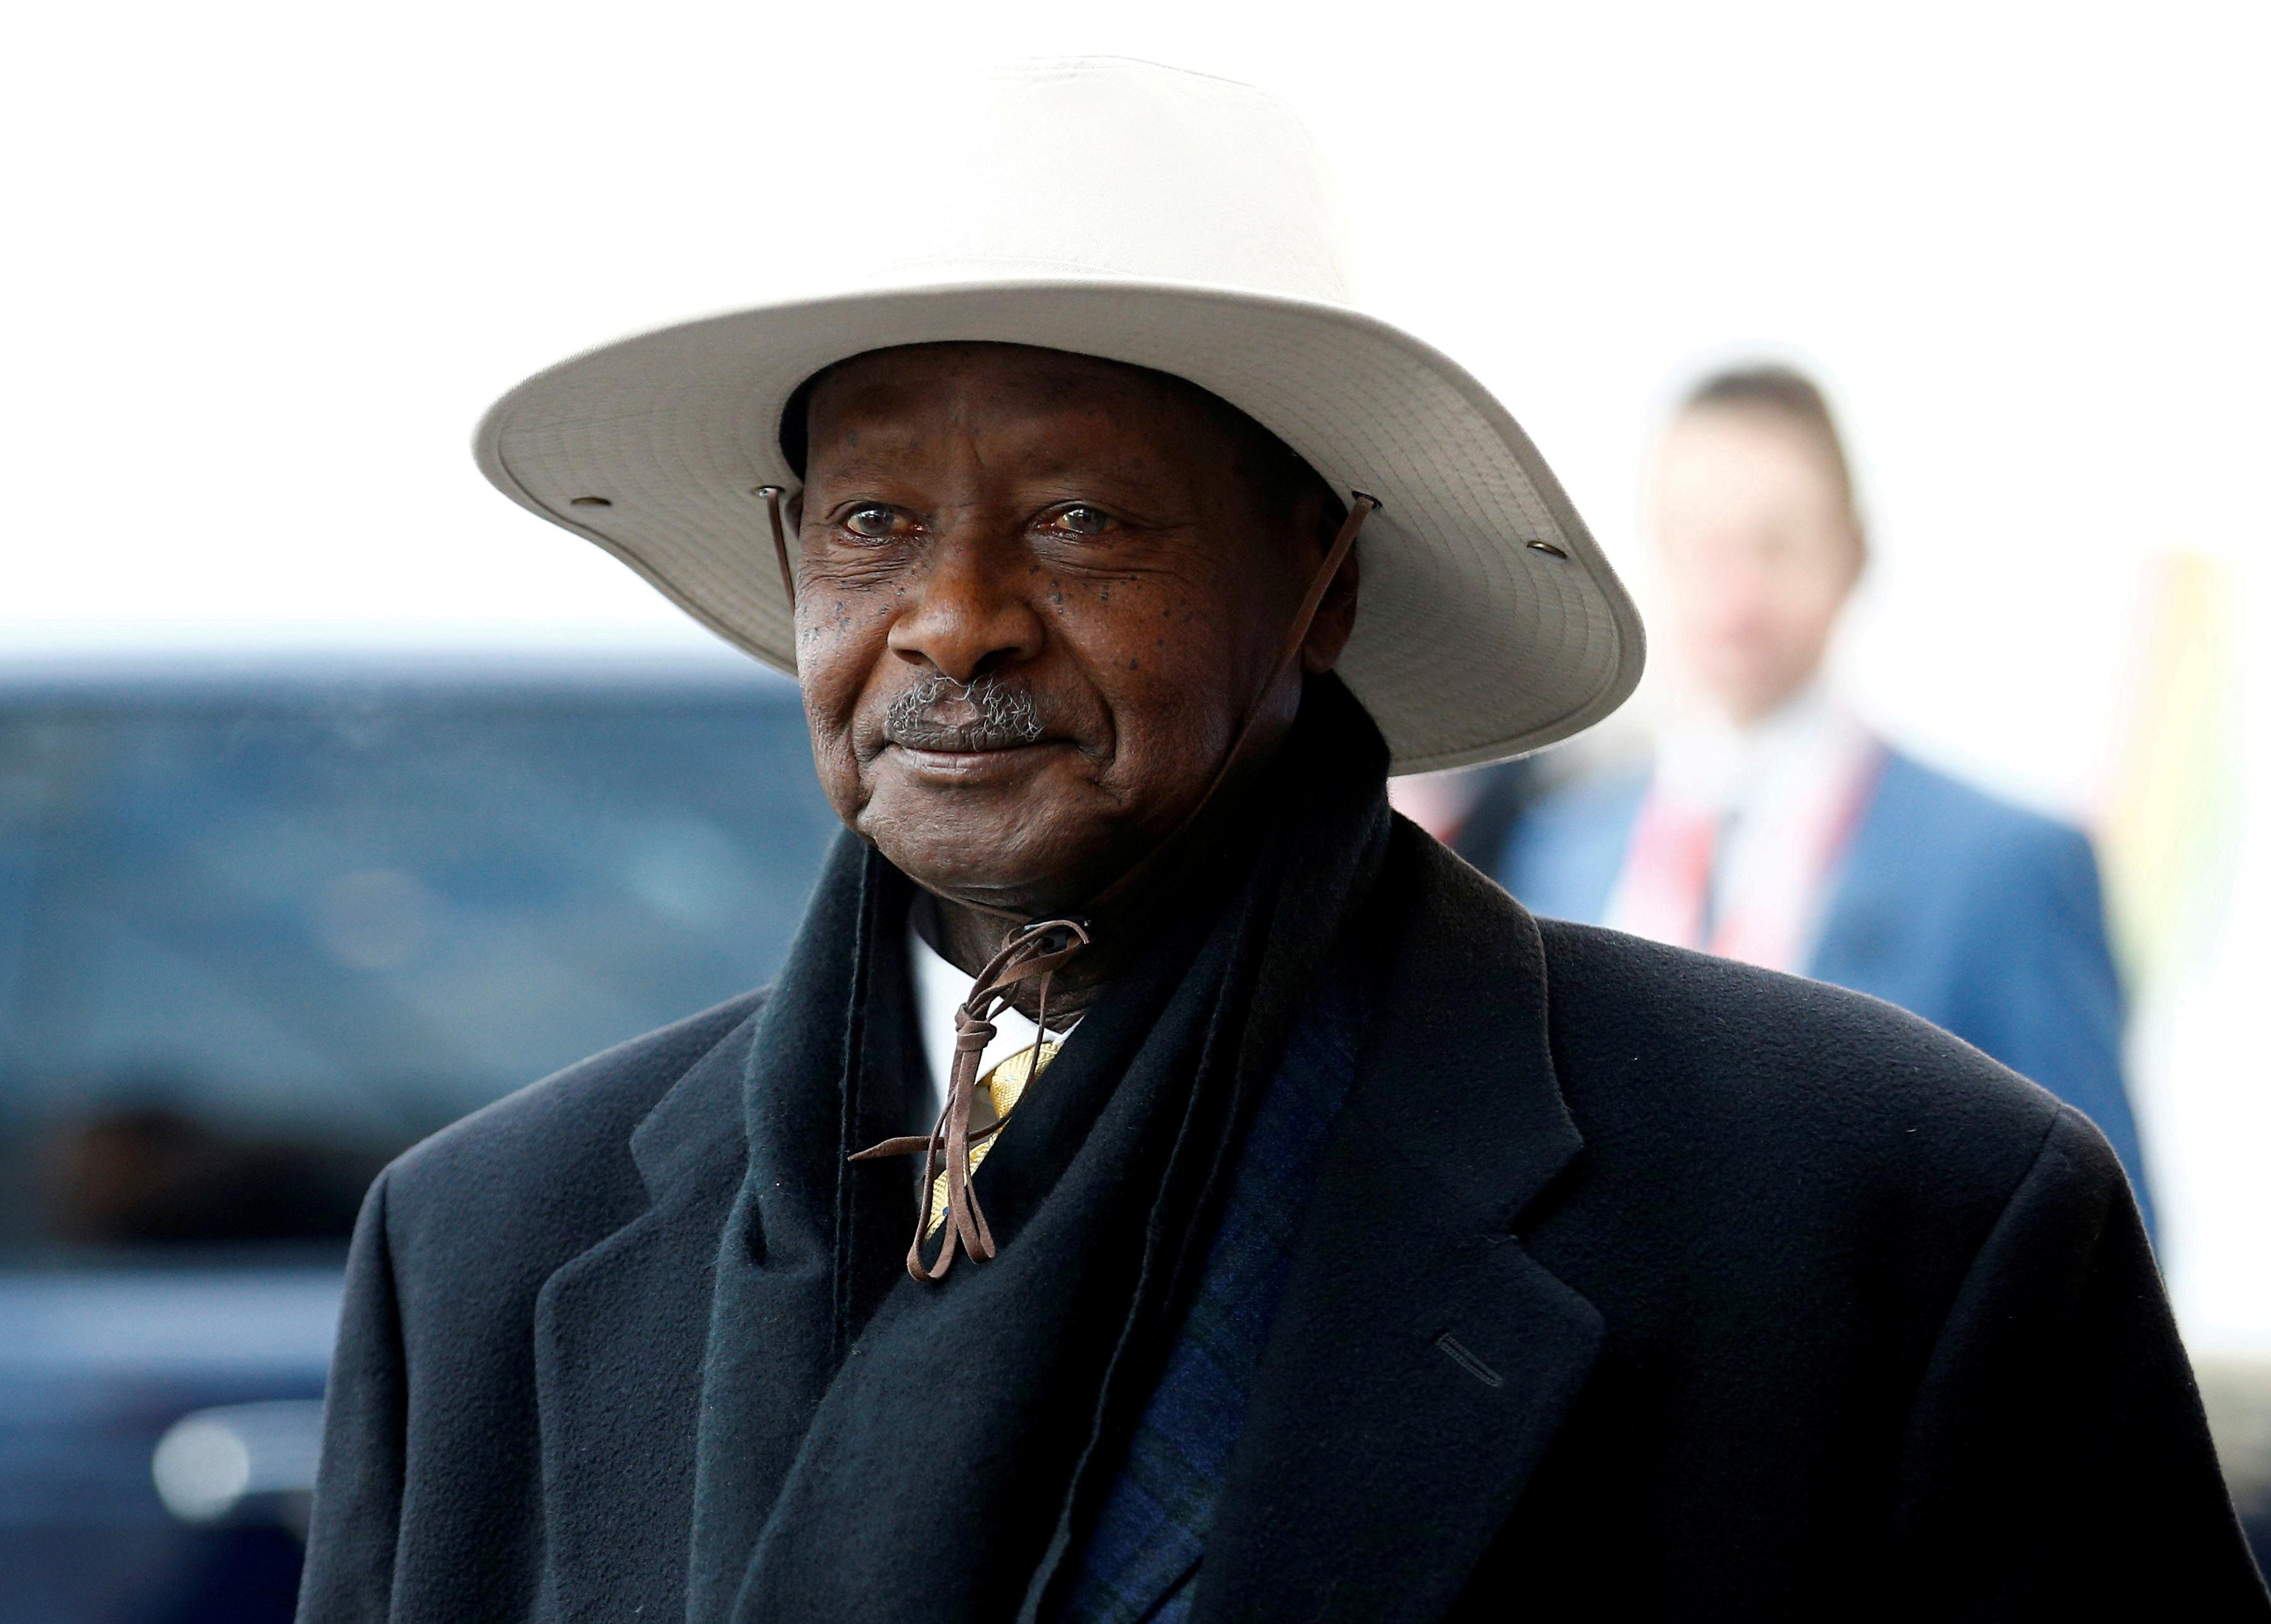 Uganda's President Yoweri Museveni arrives at the UK-Africa Investment Summit in London, Britain January 20, 2020. REUTERS/Henry Nicholls/File Photo/File Photo